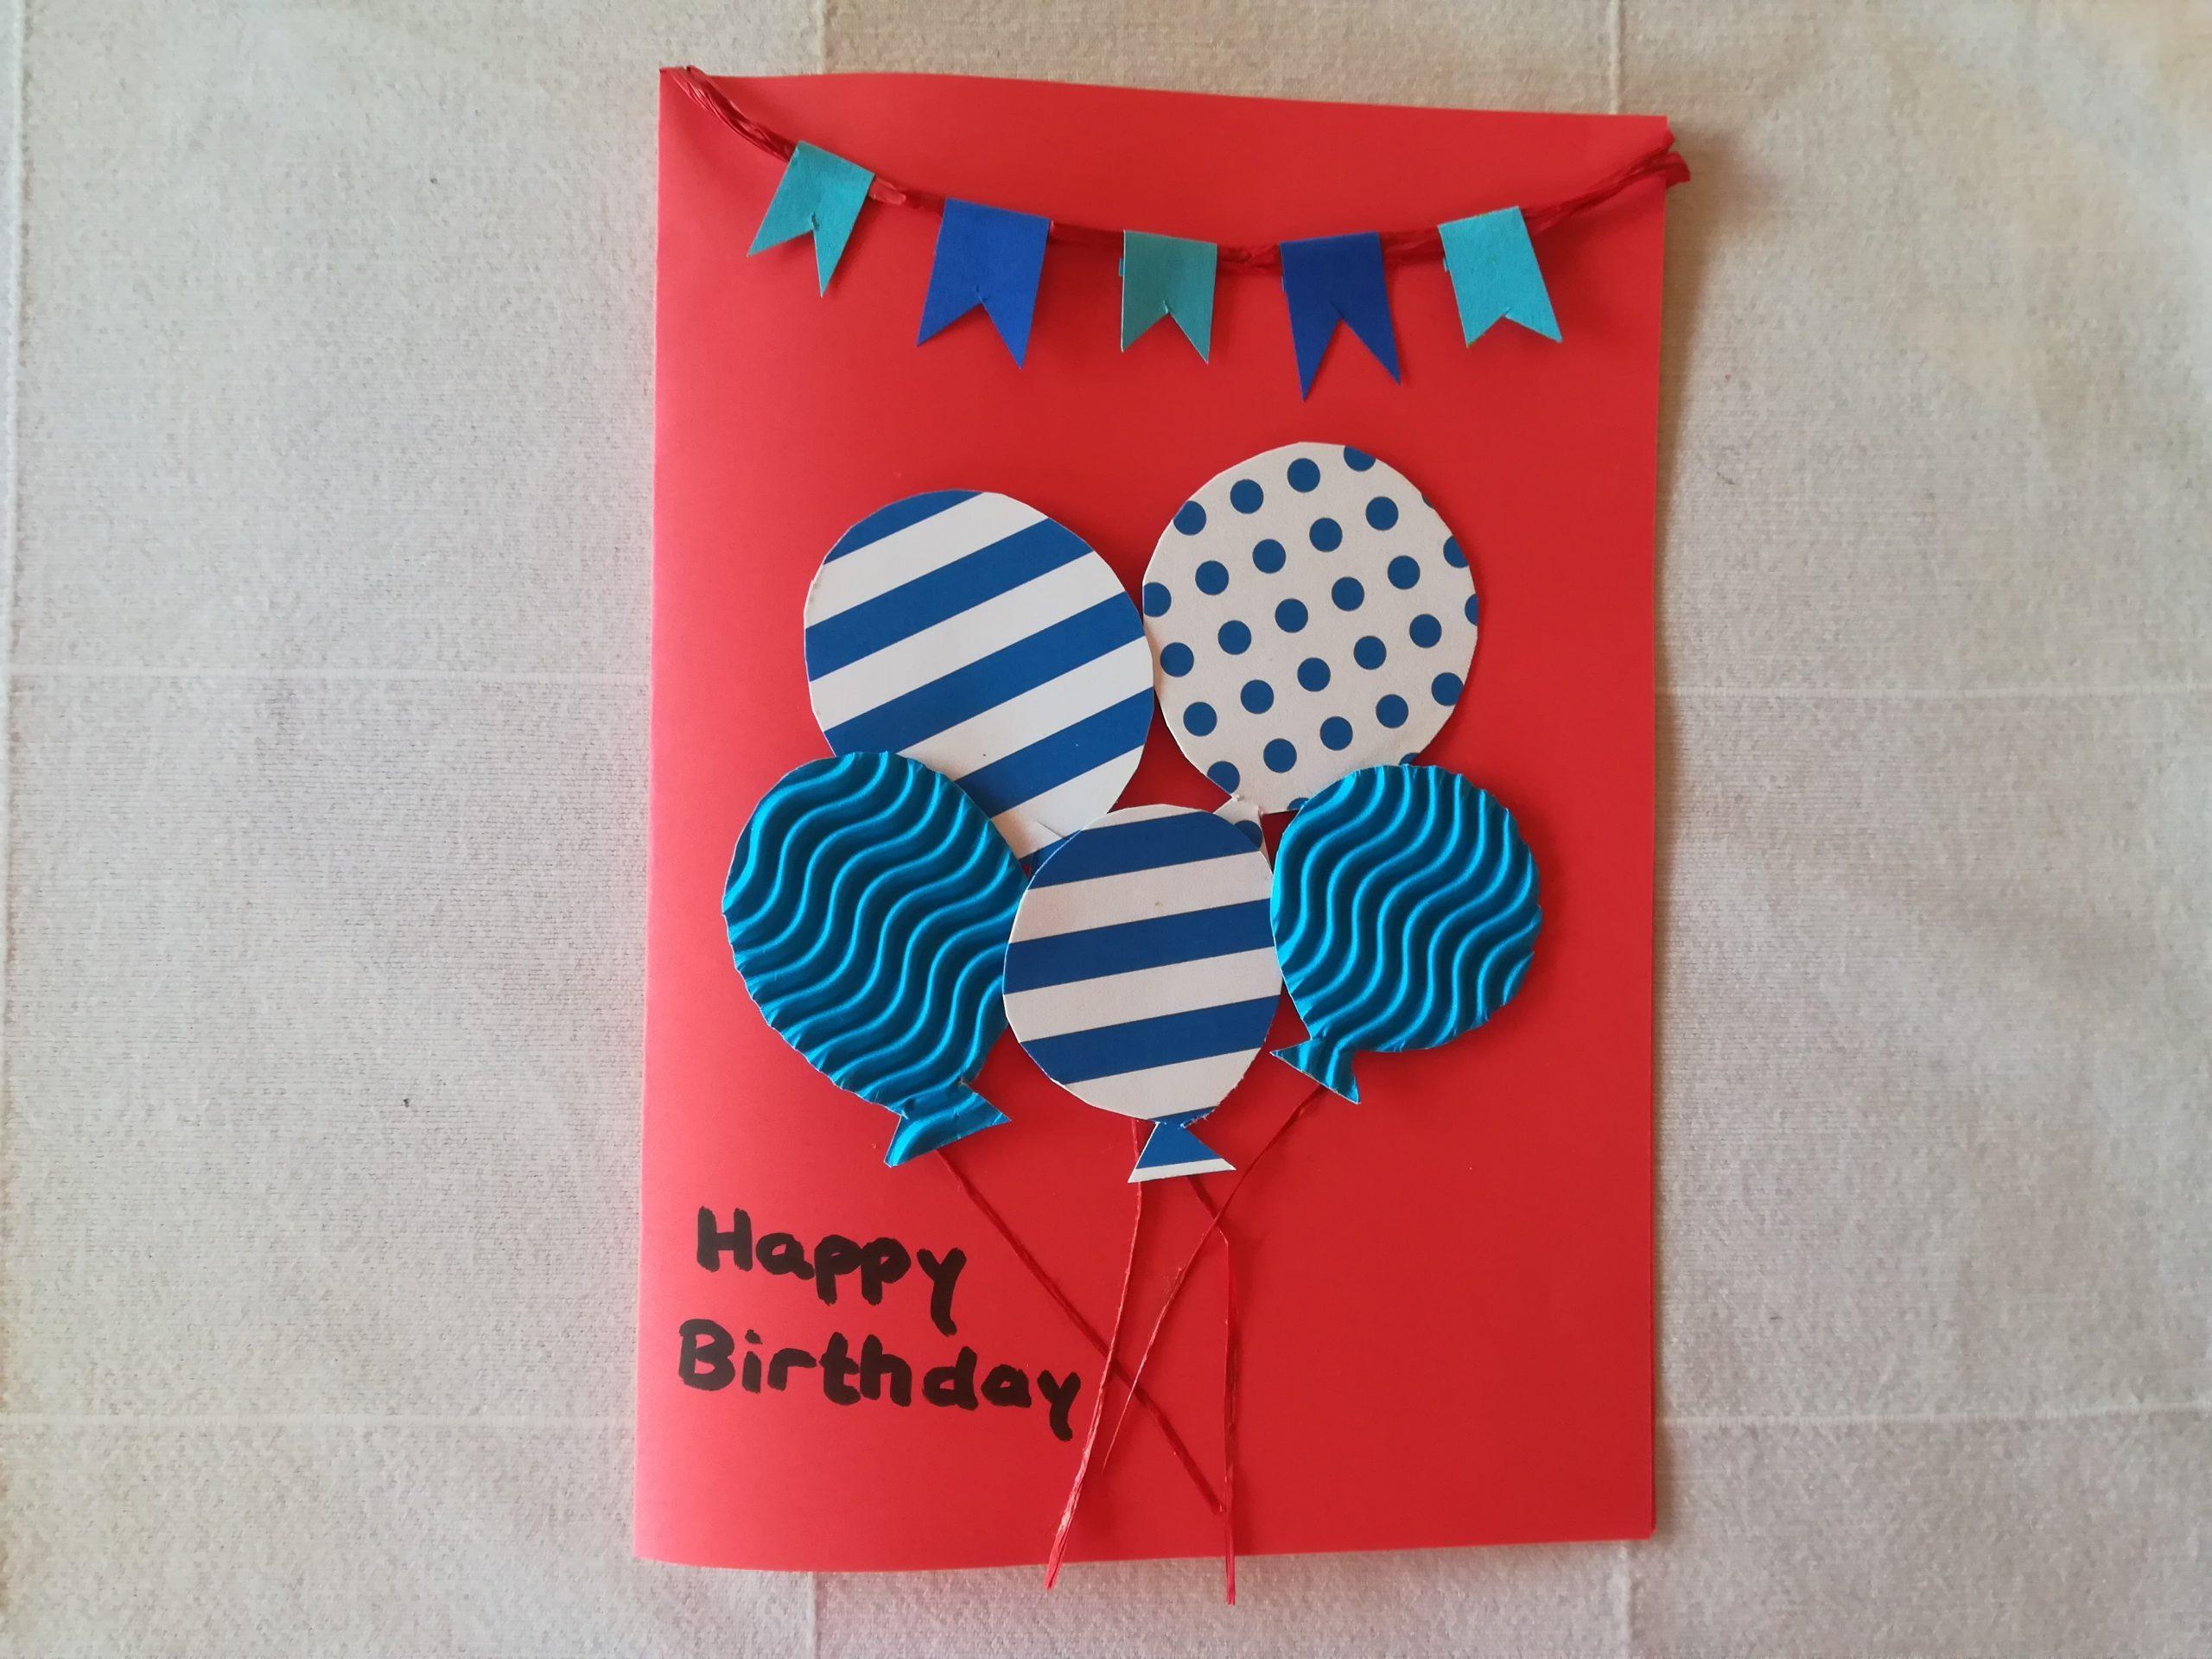 Geburtstagskarte Basteln: 3 Ausgefallene Ideen | Focus.de innen Geburtstagskarten Ideen